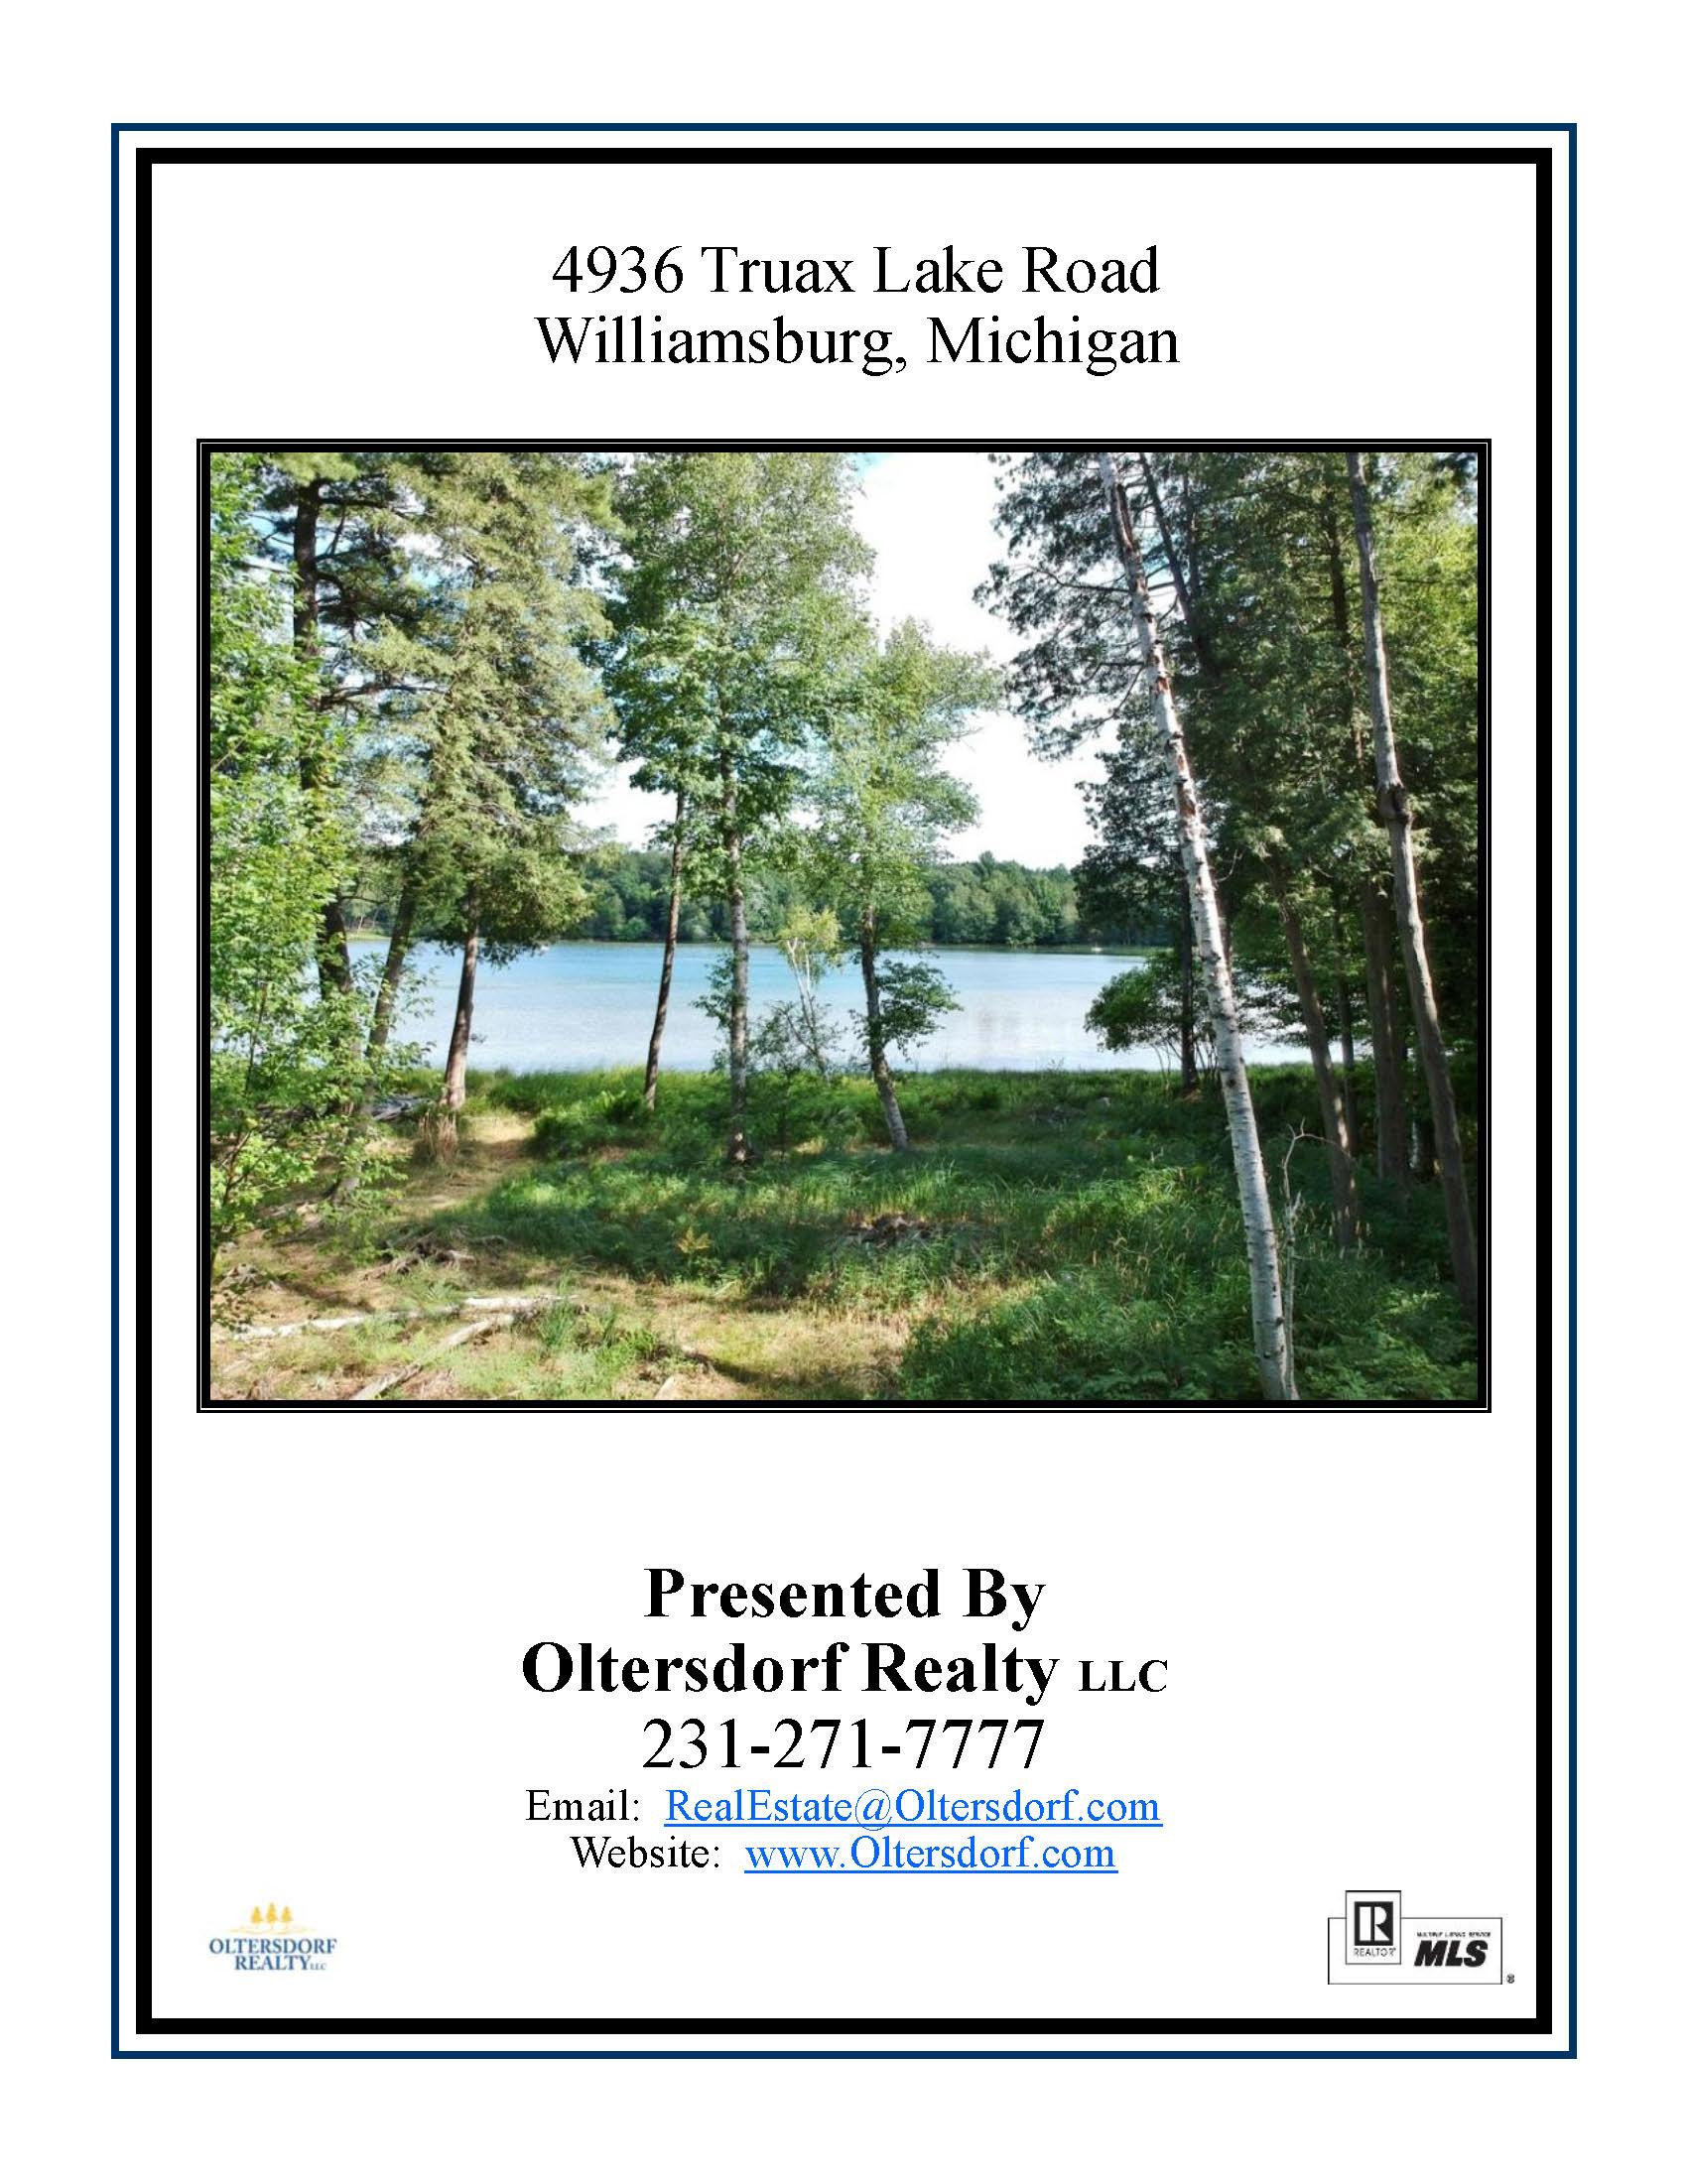 4936 Truax Lake Road, Williamsburg Marketing - For Sale by Oltersdorf Realty LLC (1).jpg